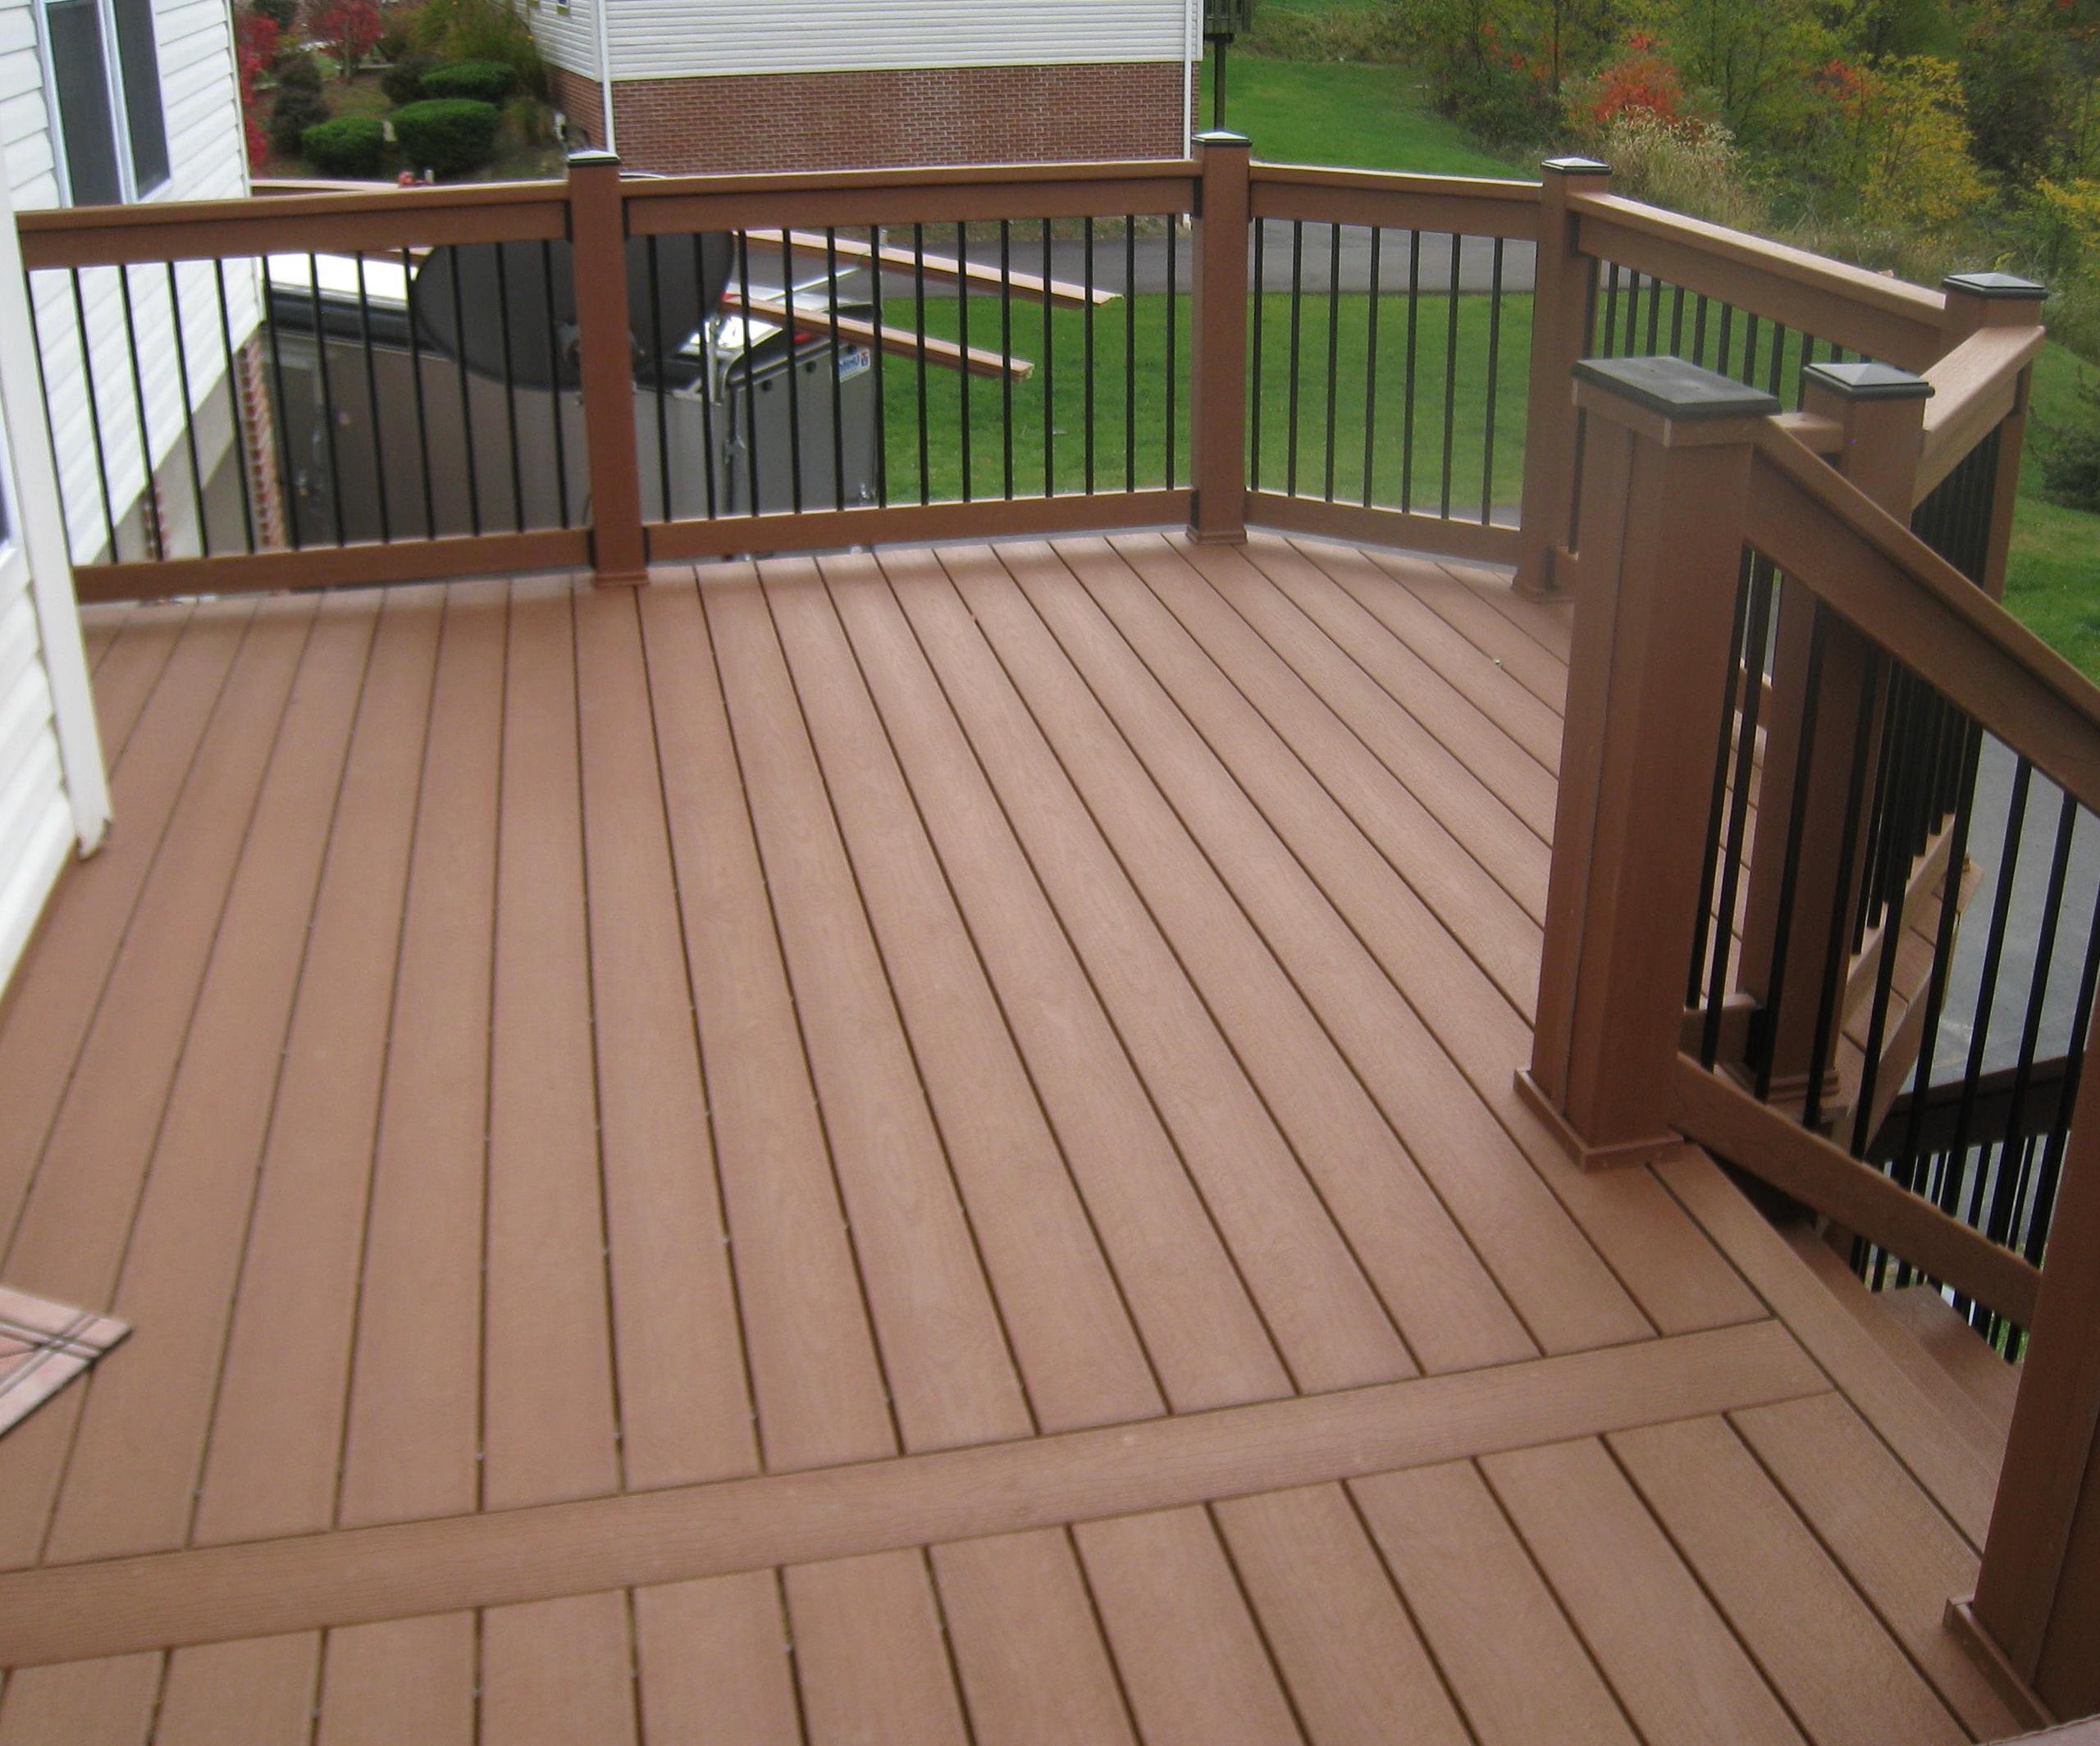 Wooden deck handrail designs home design ideas for Wooden decks design ideas